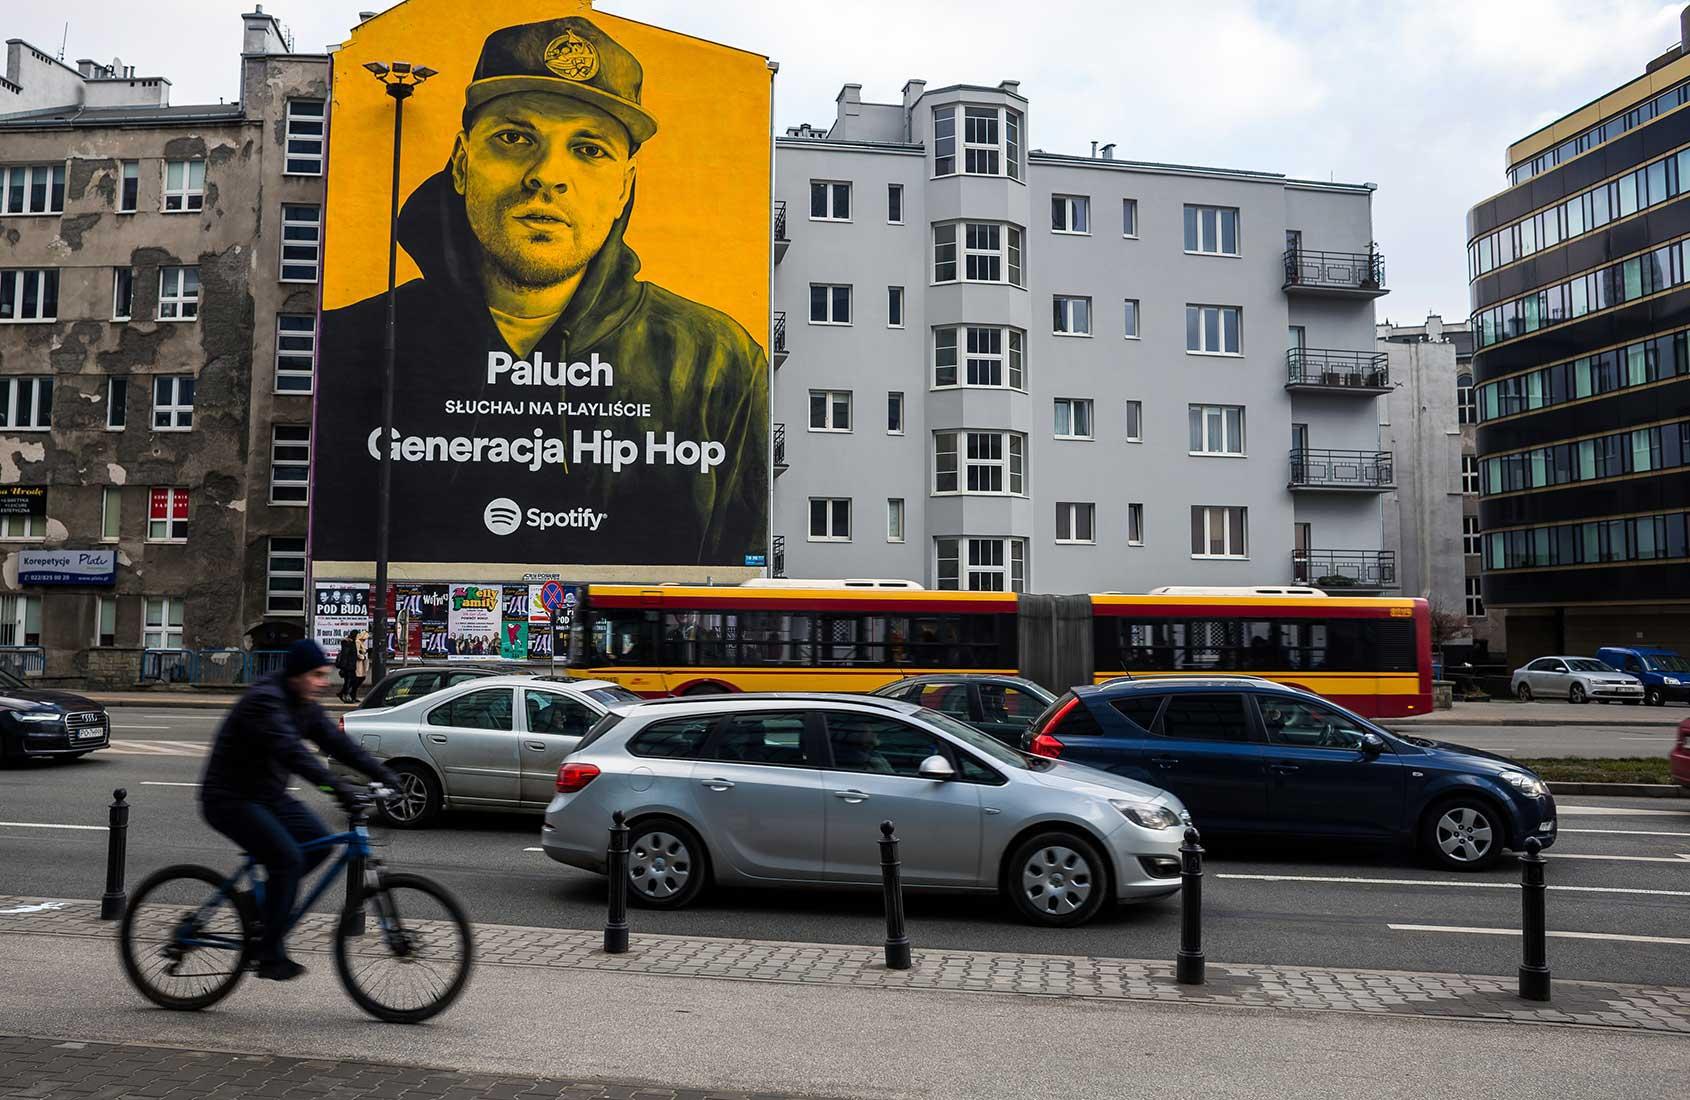 Paluch Politechnika IDEAMO mural